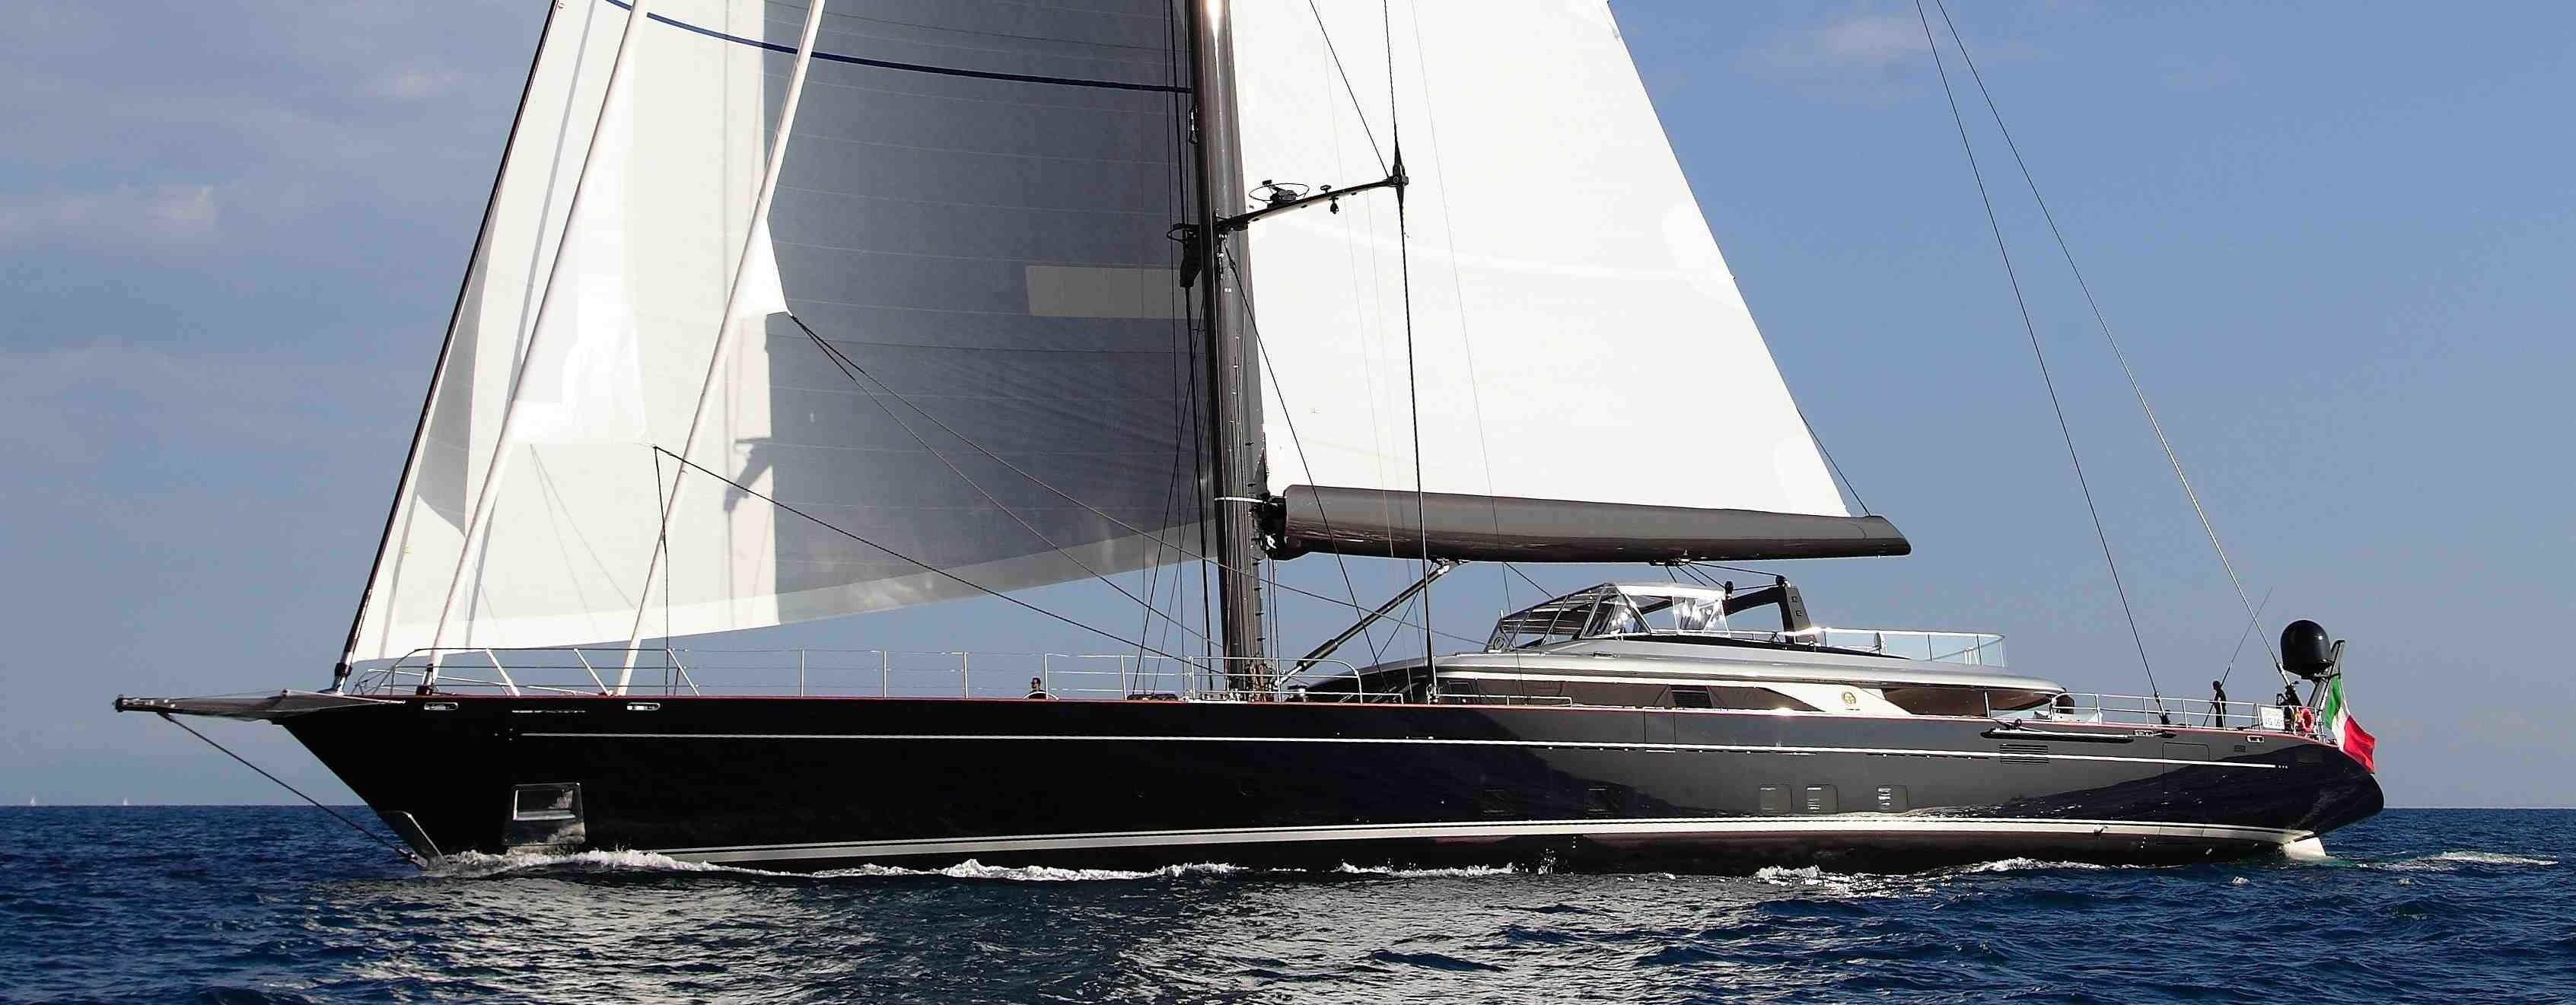 60m custom sloop by Perini Navi